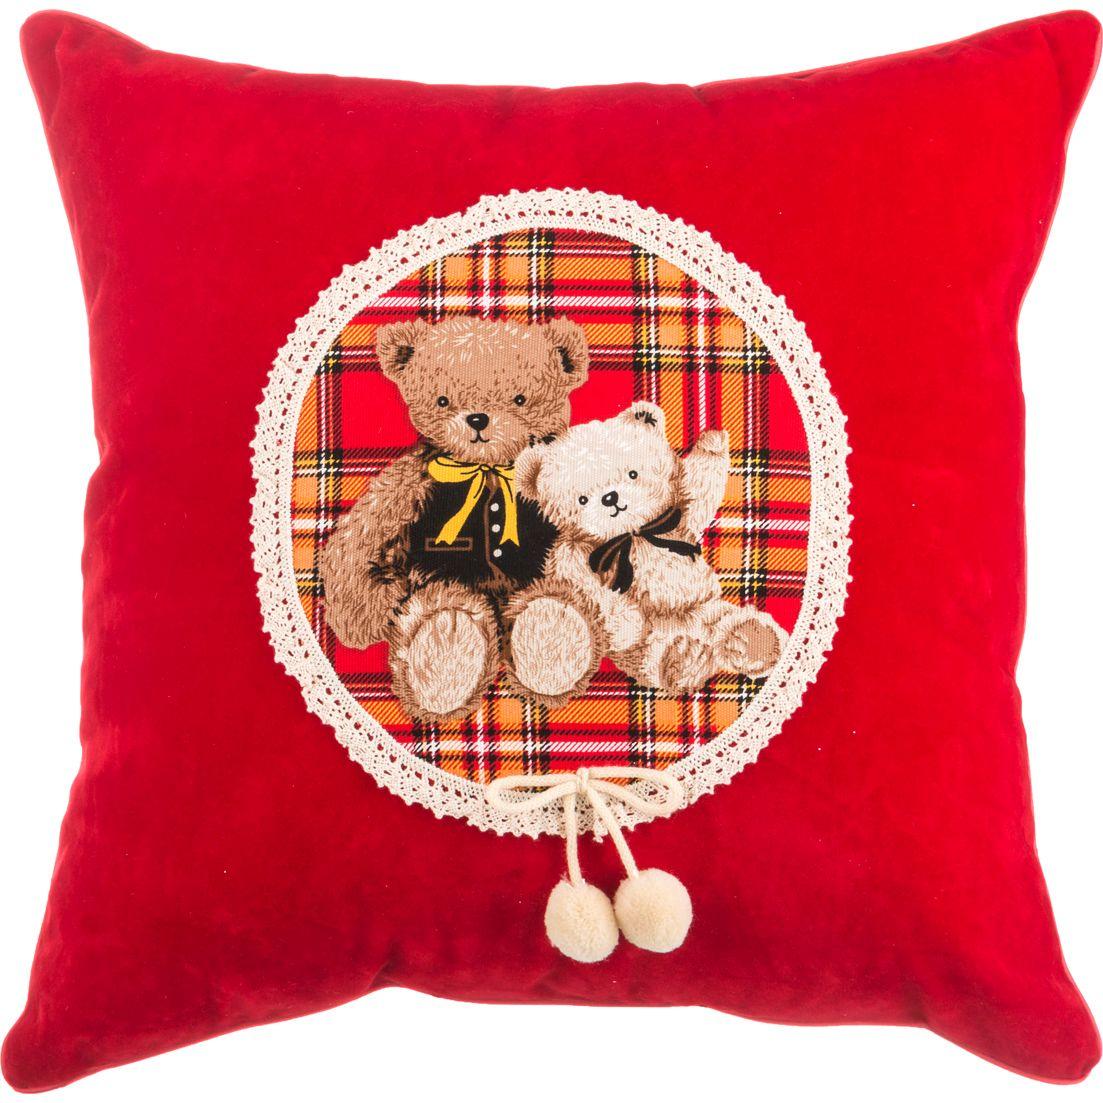 Купить Декоративные подушки Santalino, Декоративная подушка Мишка (43х43), Россия, Поликоттон